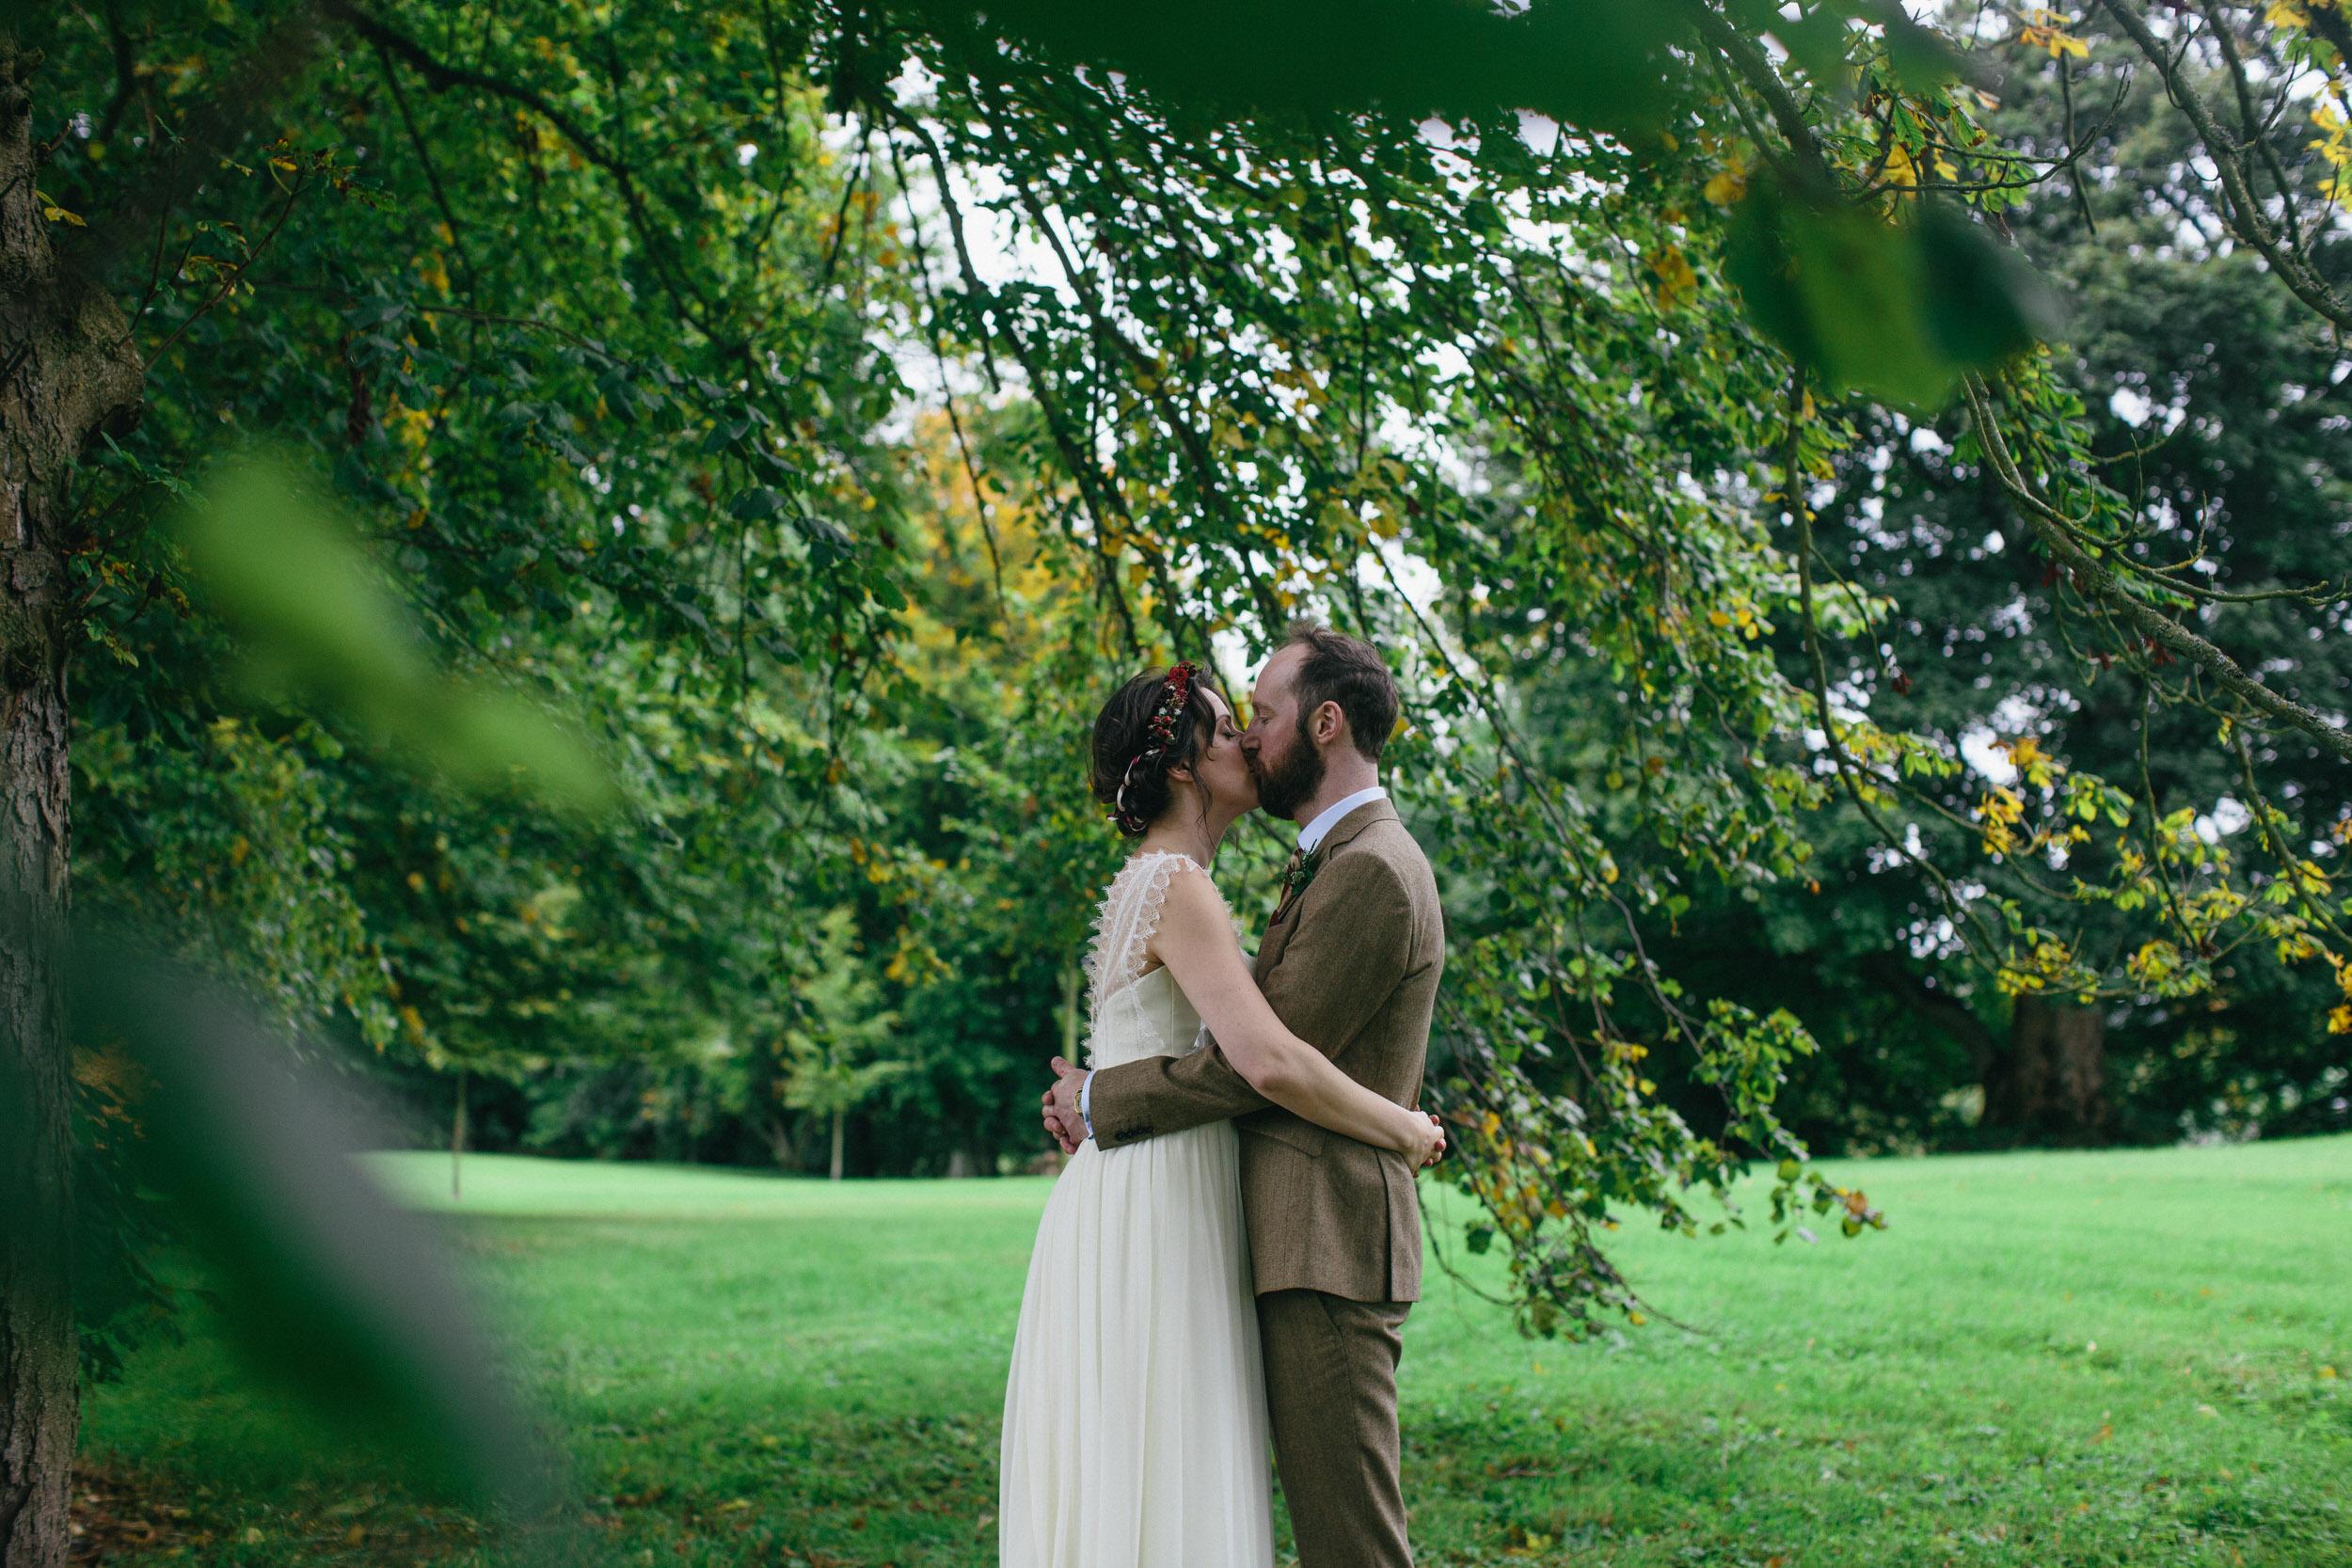 Quirky Wedding Photography Scotland Borders Biggar Hartree 063.jpg